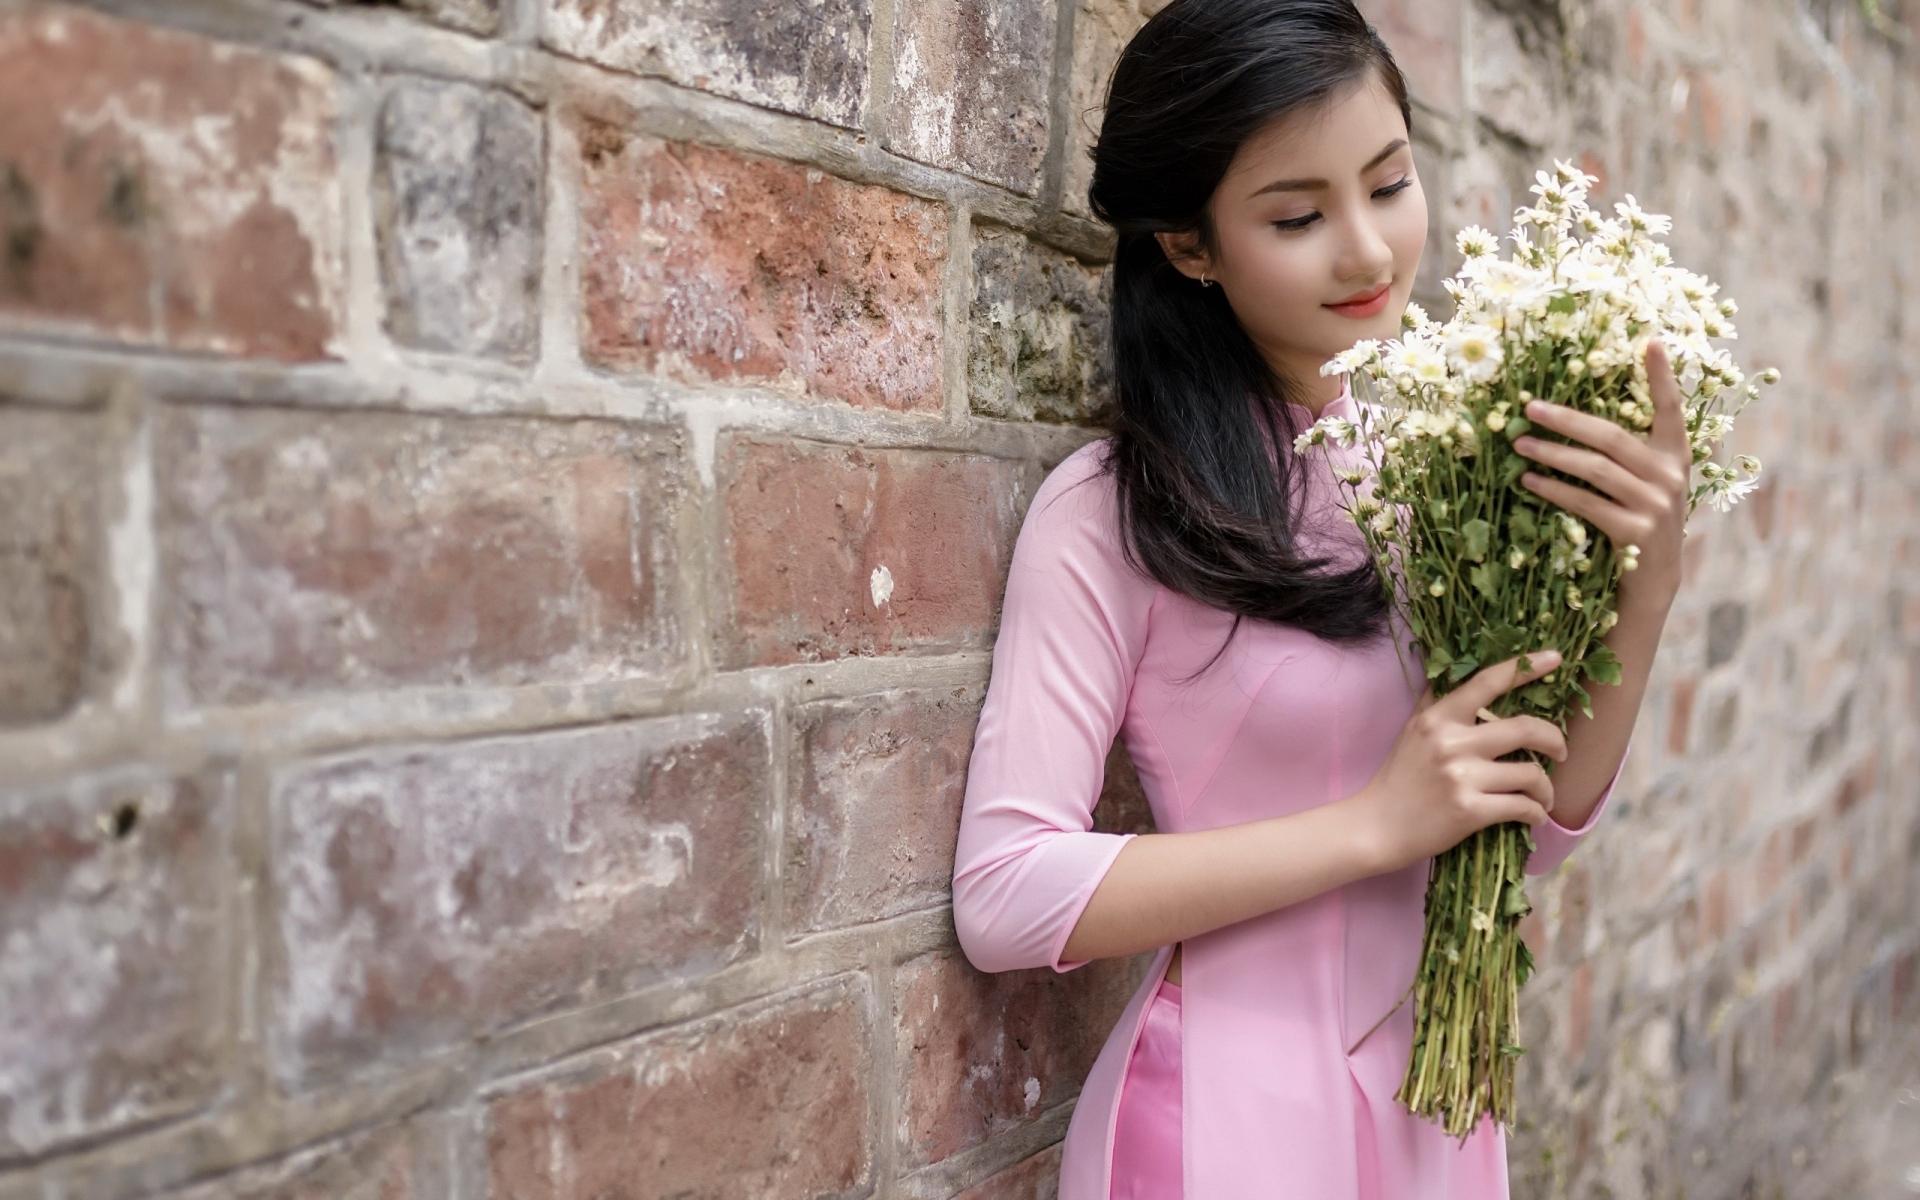 Download 1920x1200 wallpaper asian woman with flowers brunette 1920x1200 wallpaper asian woman with flowers brunette beautiful izmirmasajfo